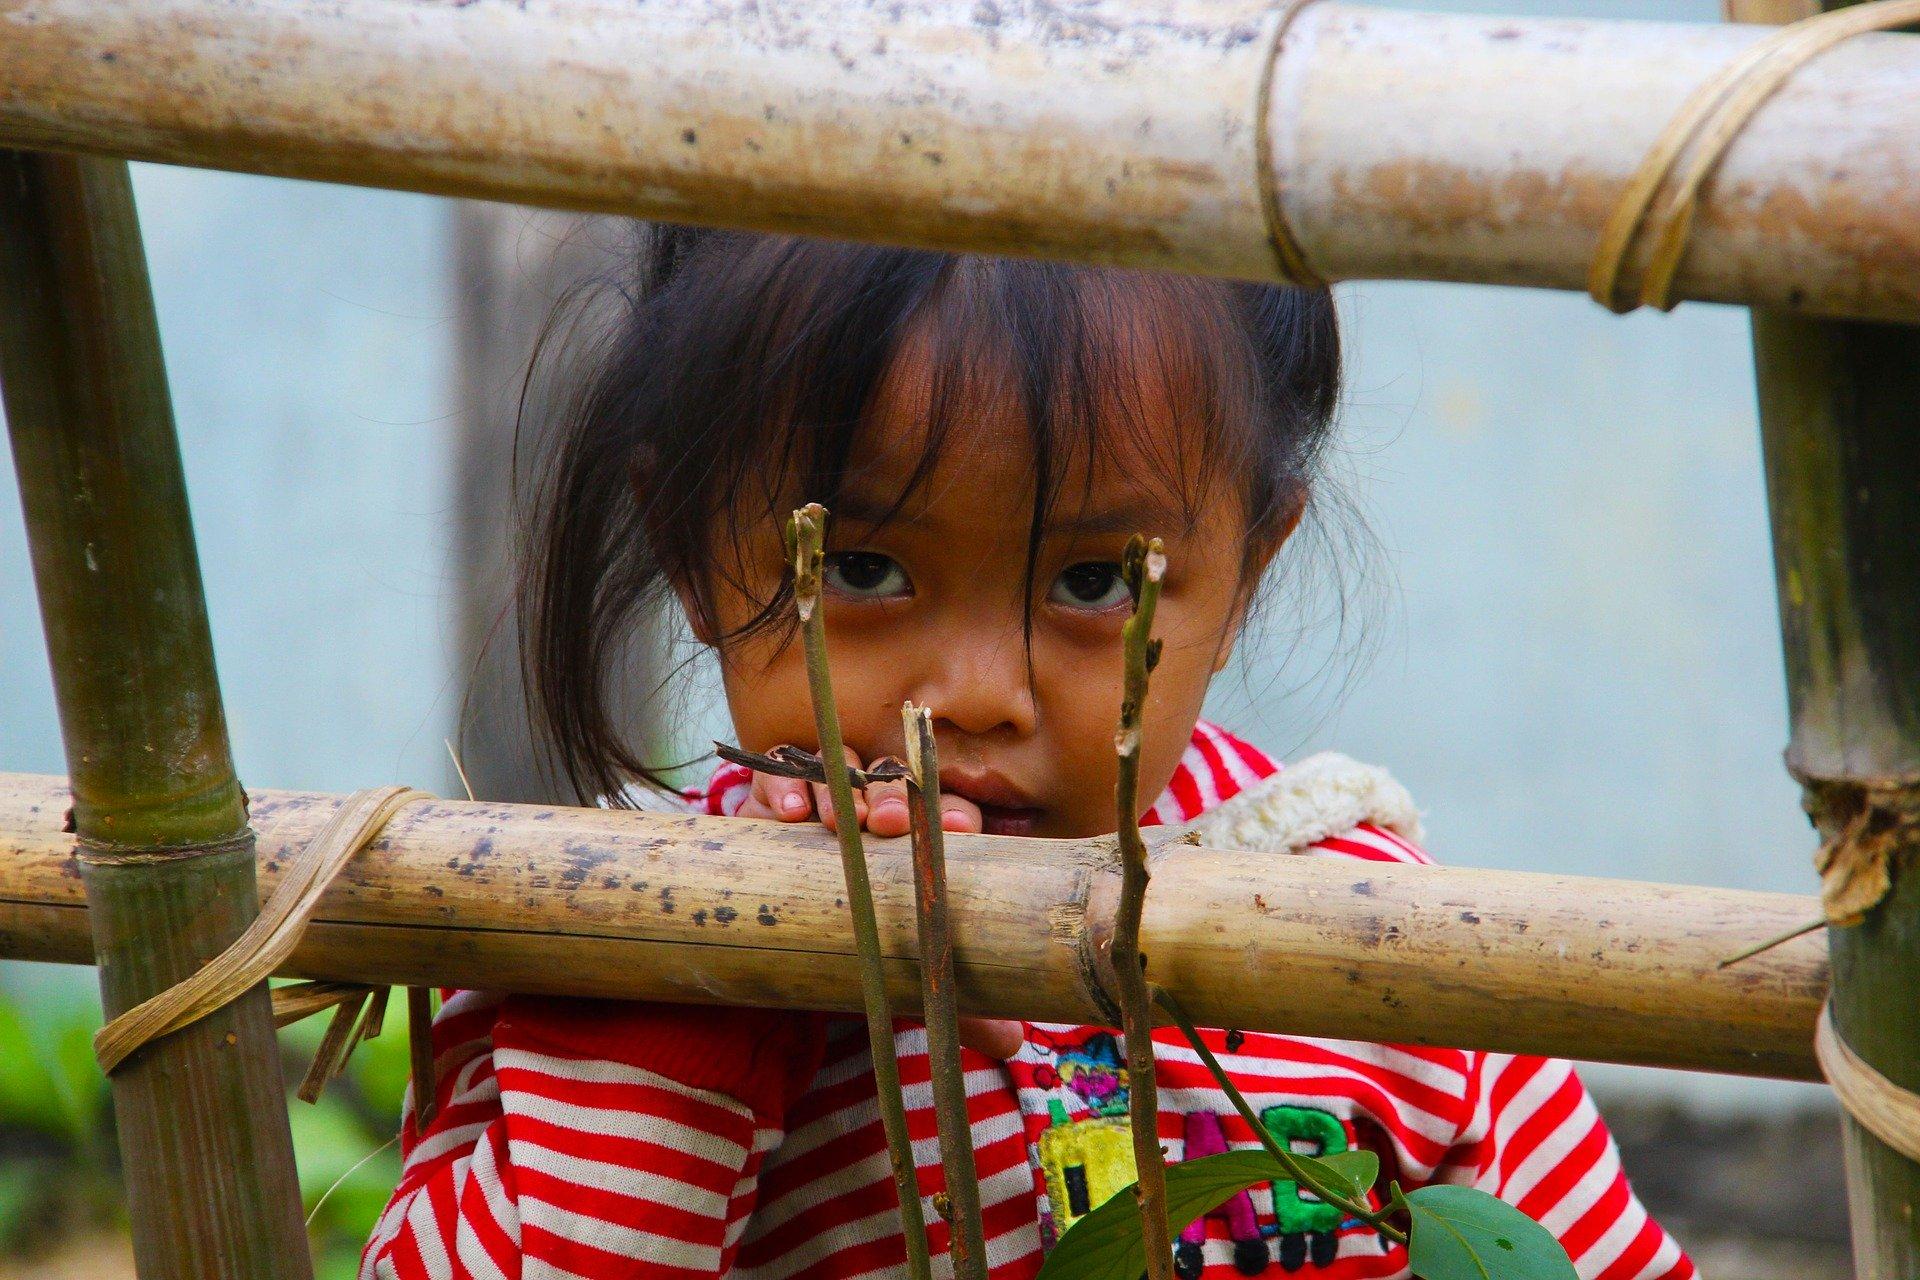 Siapakah Yang Wajib Menafkahi Anak Yatim? Ibunya atau Keluarga Ayahnya? 8